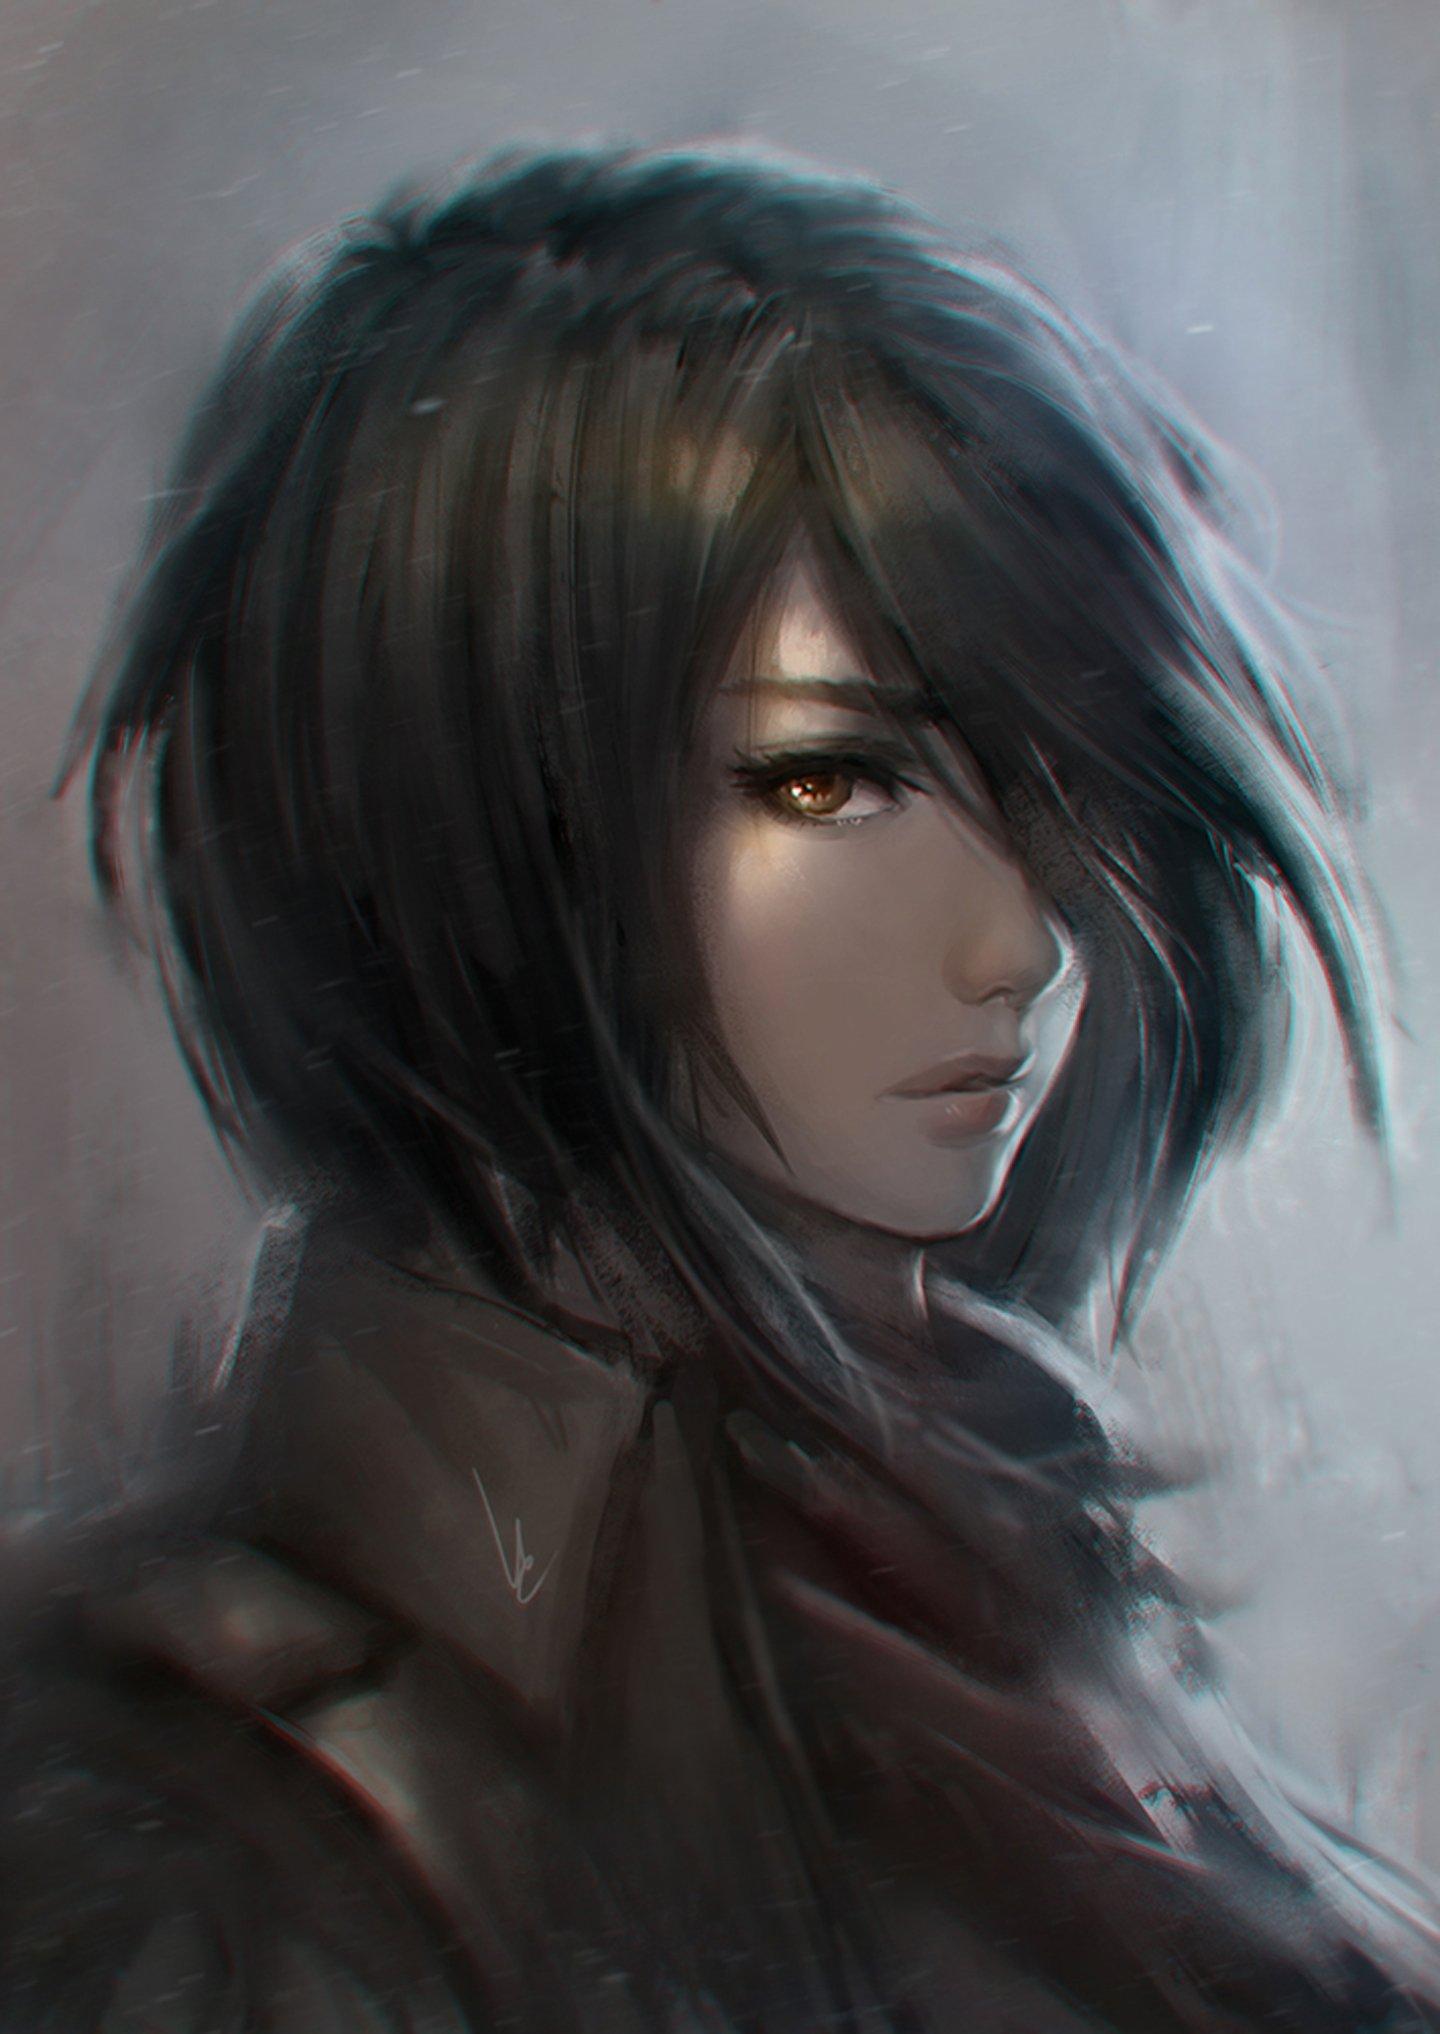 Anime series character girl short hair wallpaper 1440x2034 981924 wallpaperup